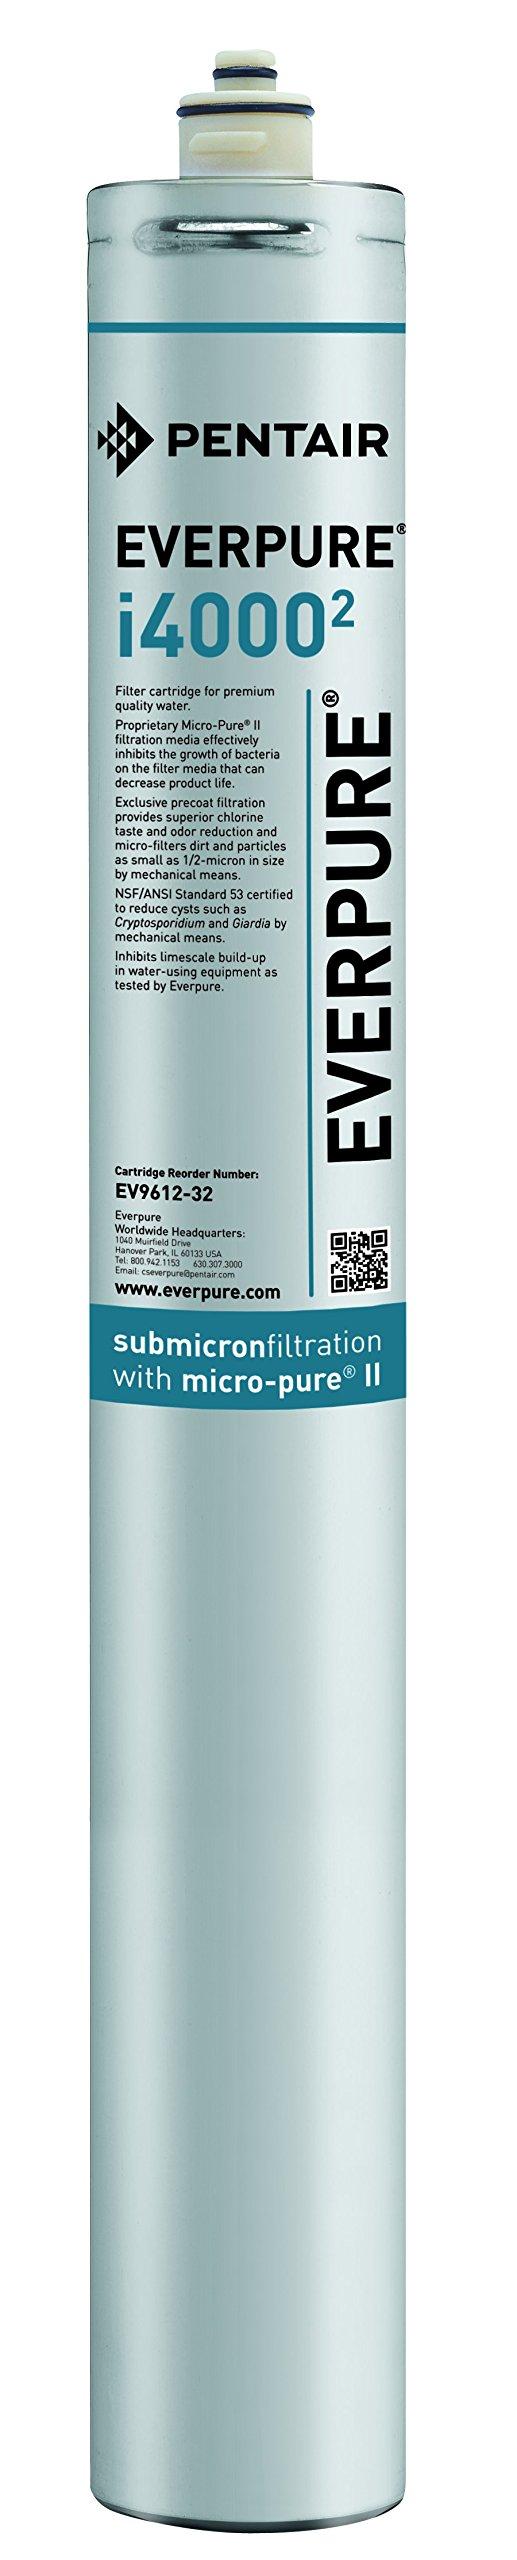 Everpure EV9612-32 i4000 2 Filter Cartridge